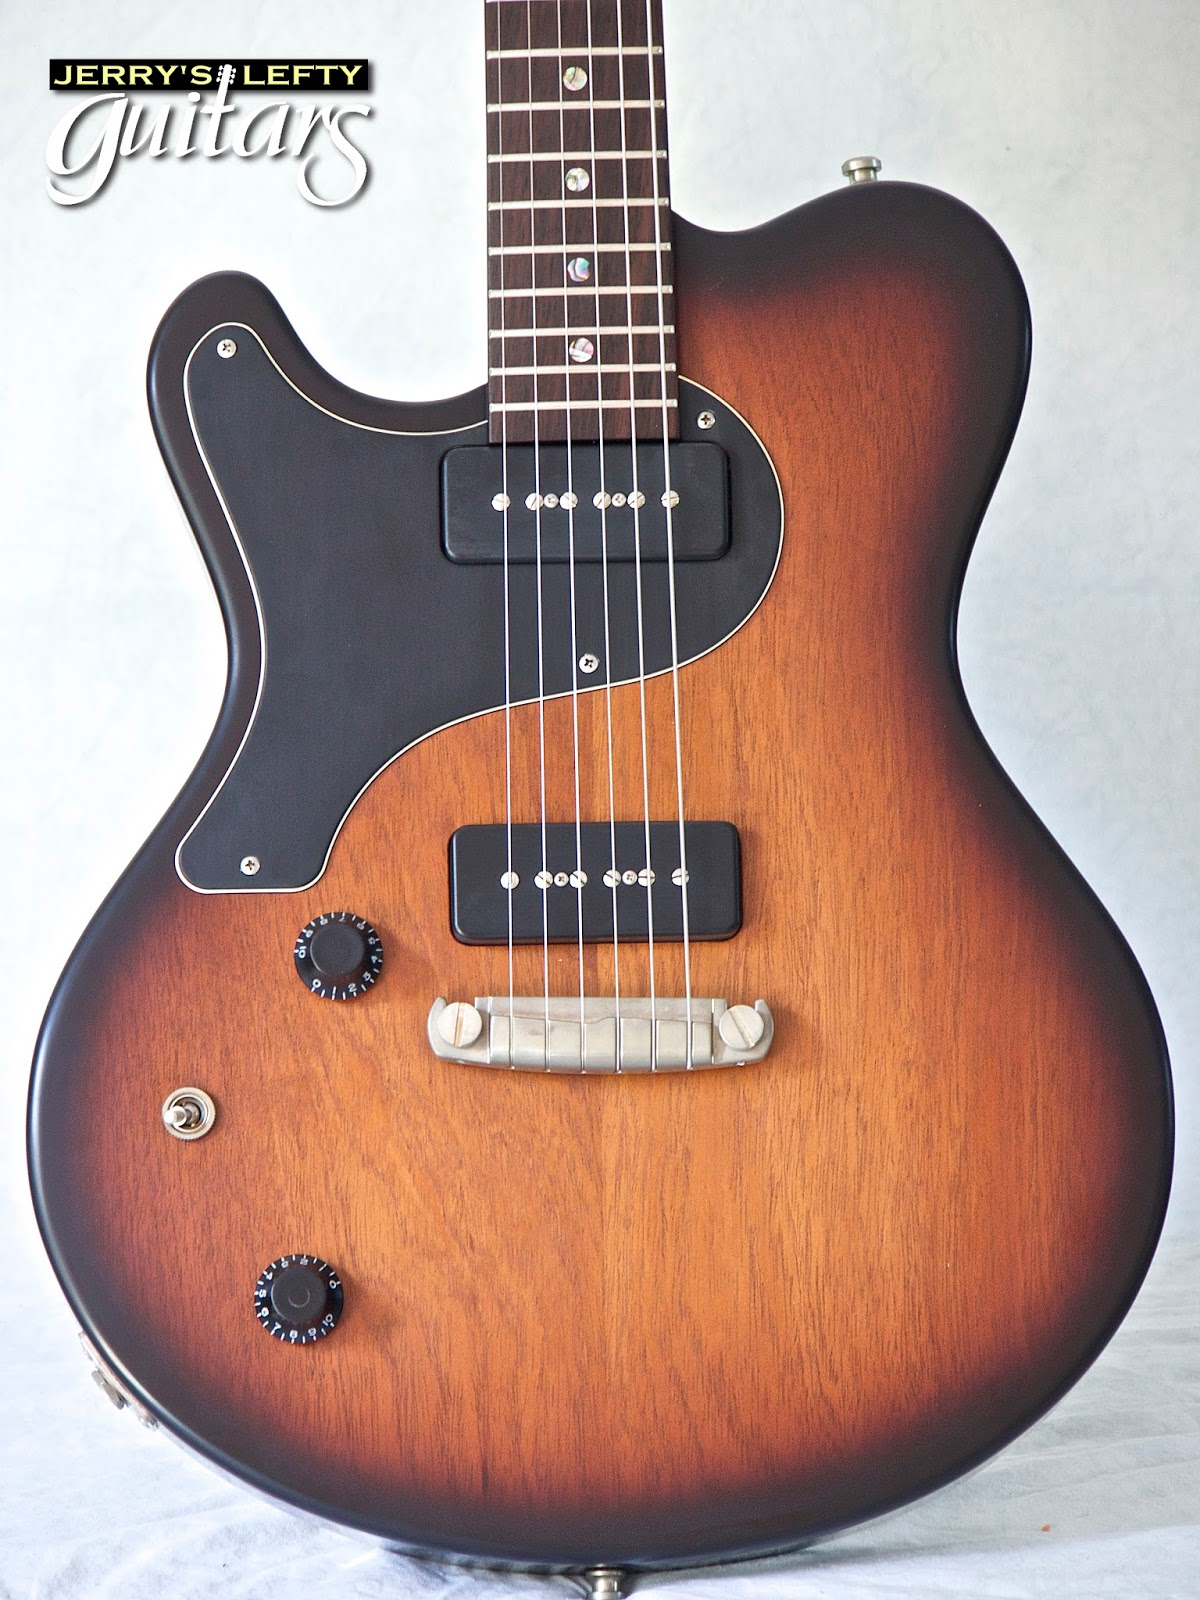 jerry 39 s lefty guitars newest guitar arrivals updated weekly nik huber jr special 2 tone. Black Bedroom Furniture Sets. Home Design Ideas